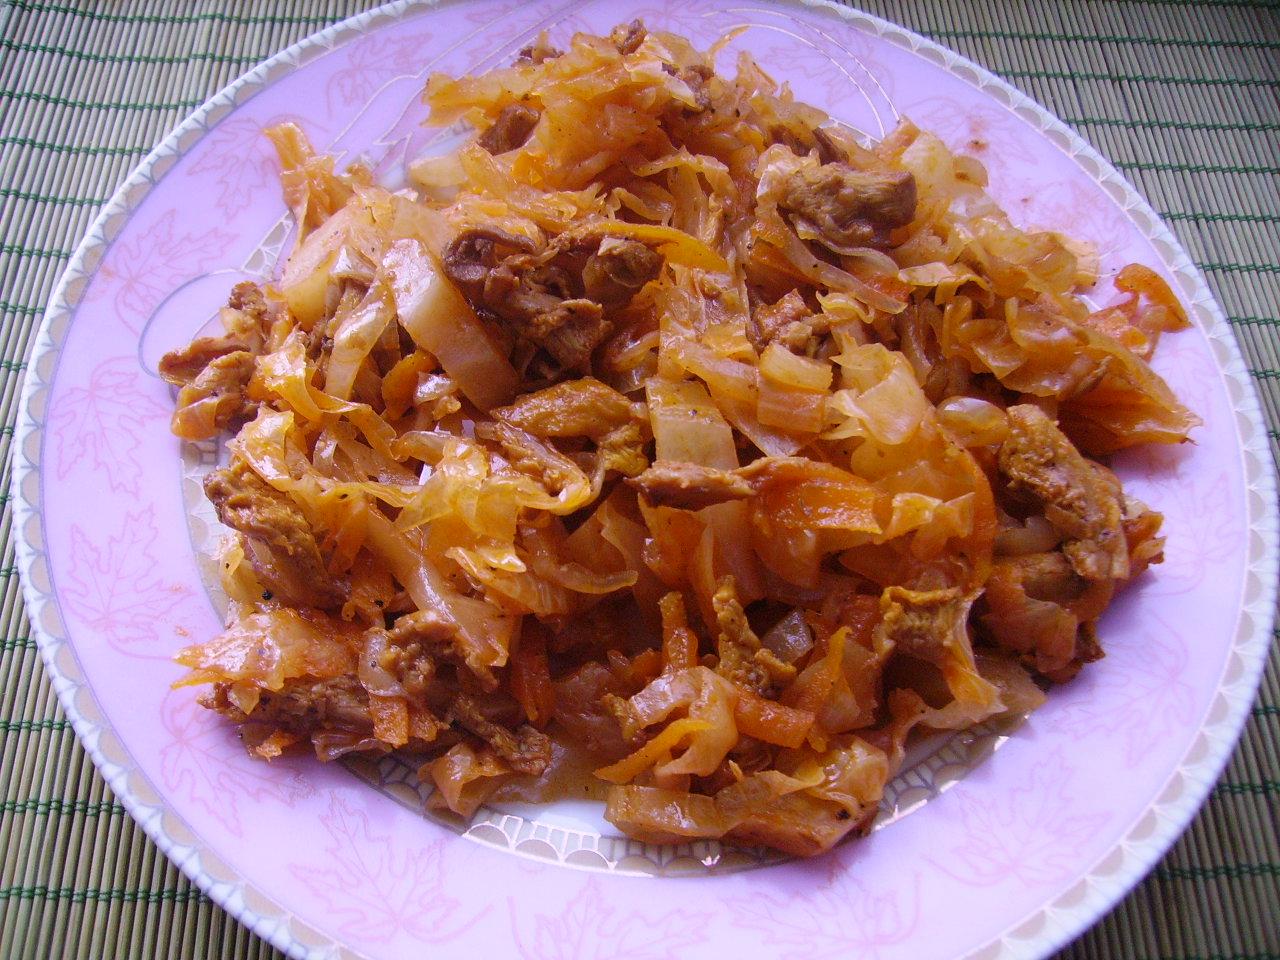 солянка с грибами рецепт на сковороде